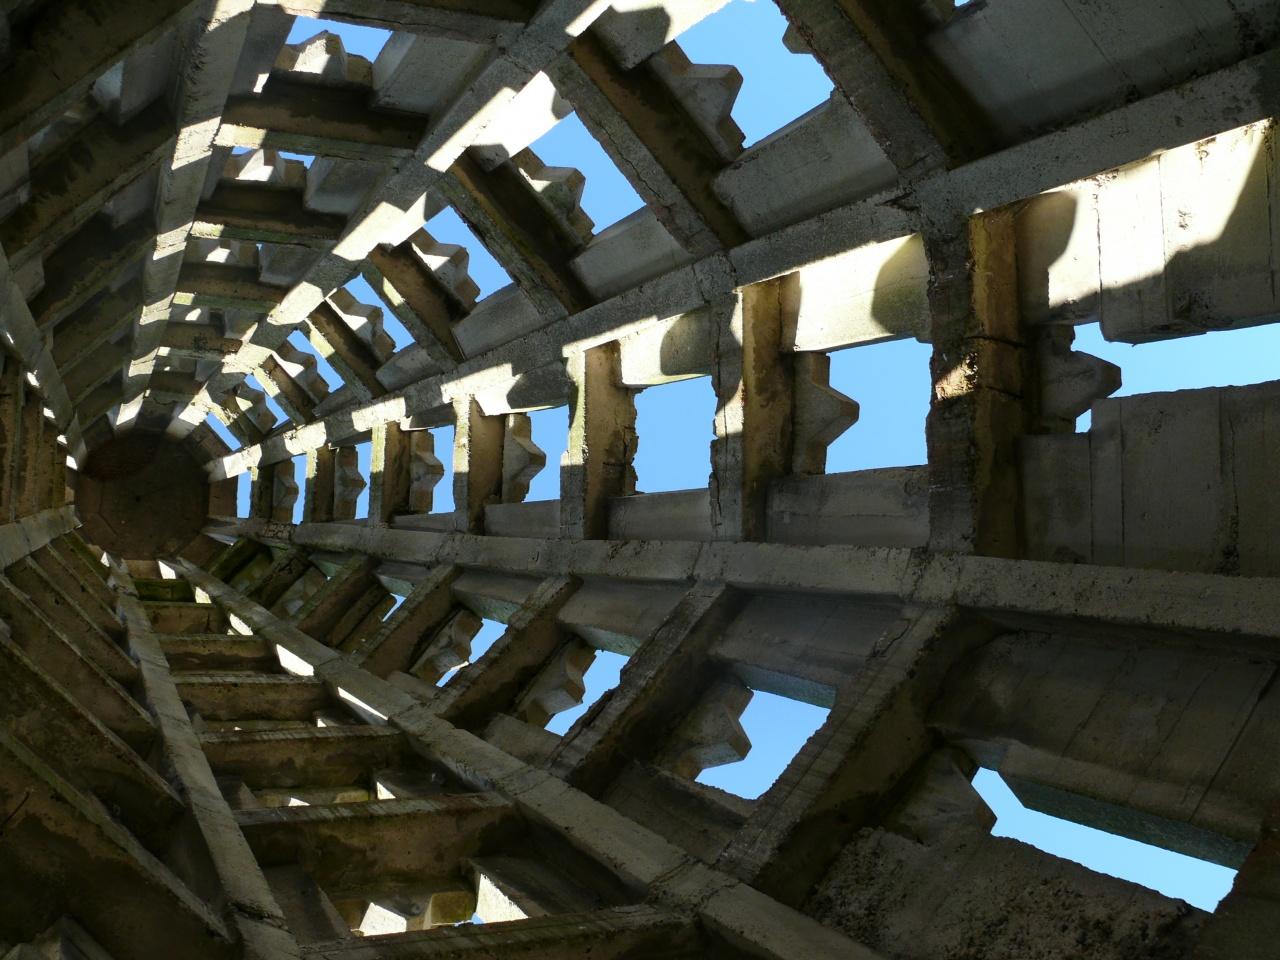 vue intérieure du clocher